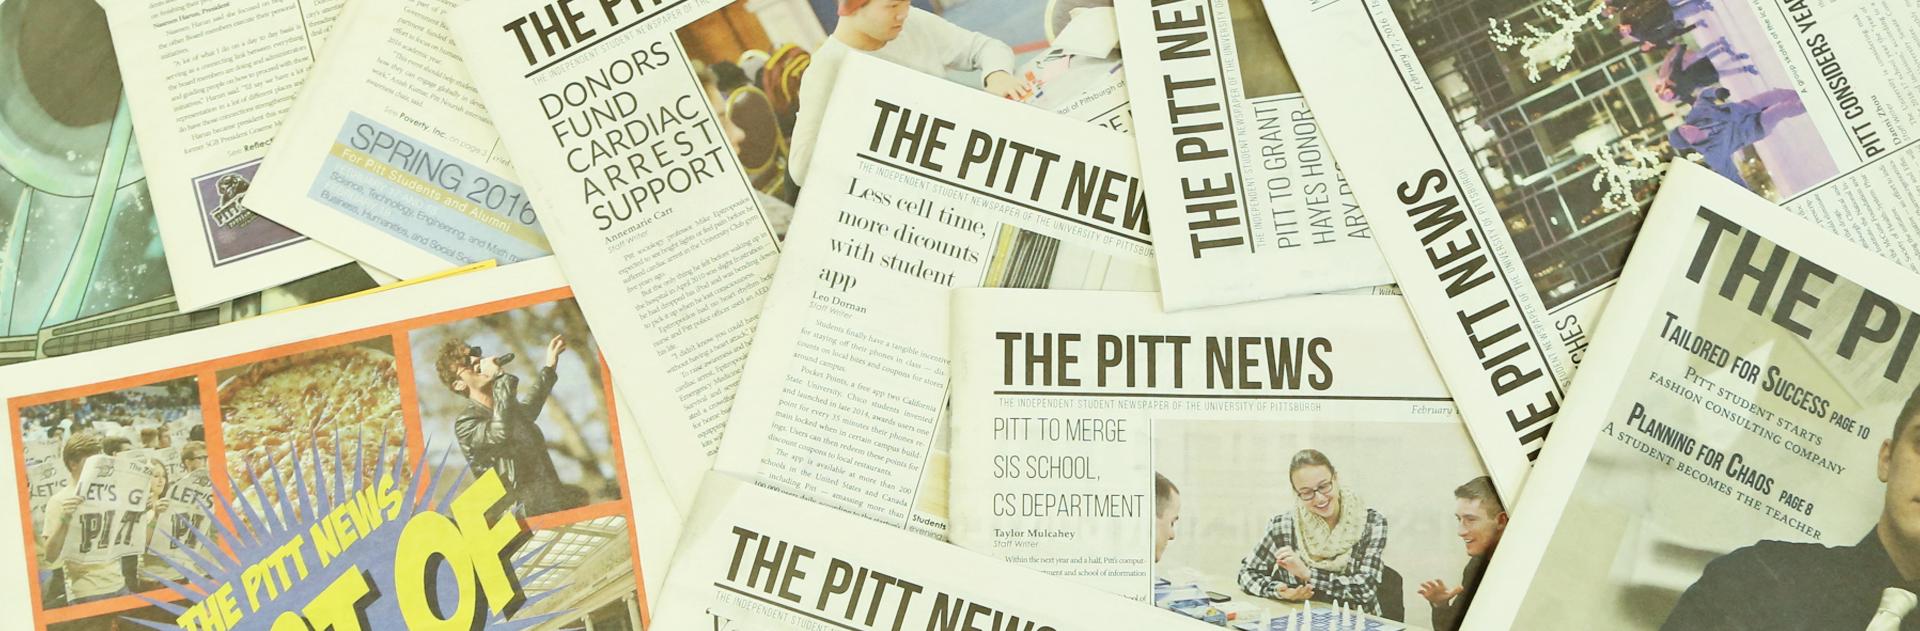 PittNews